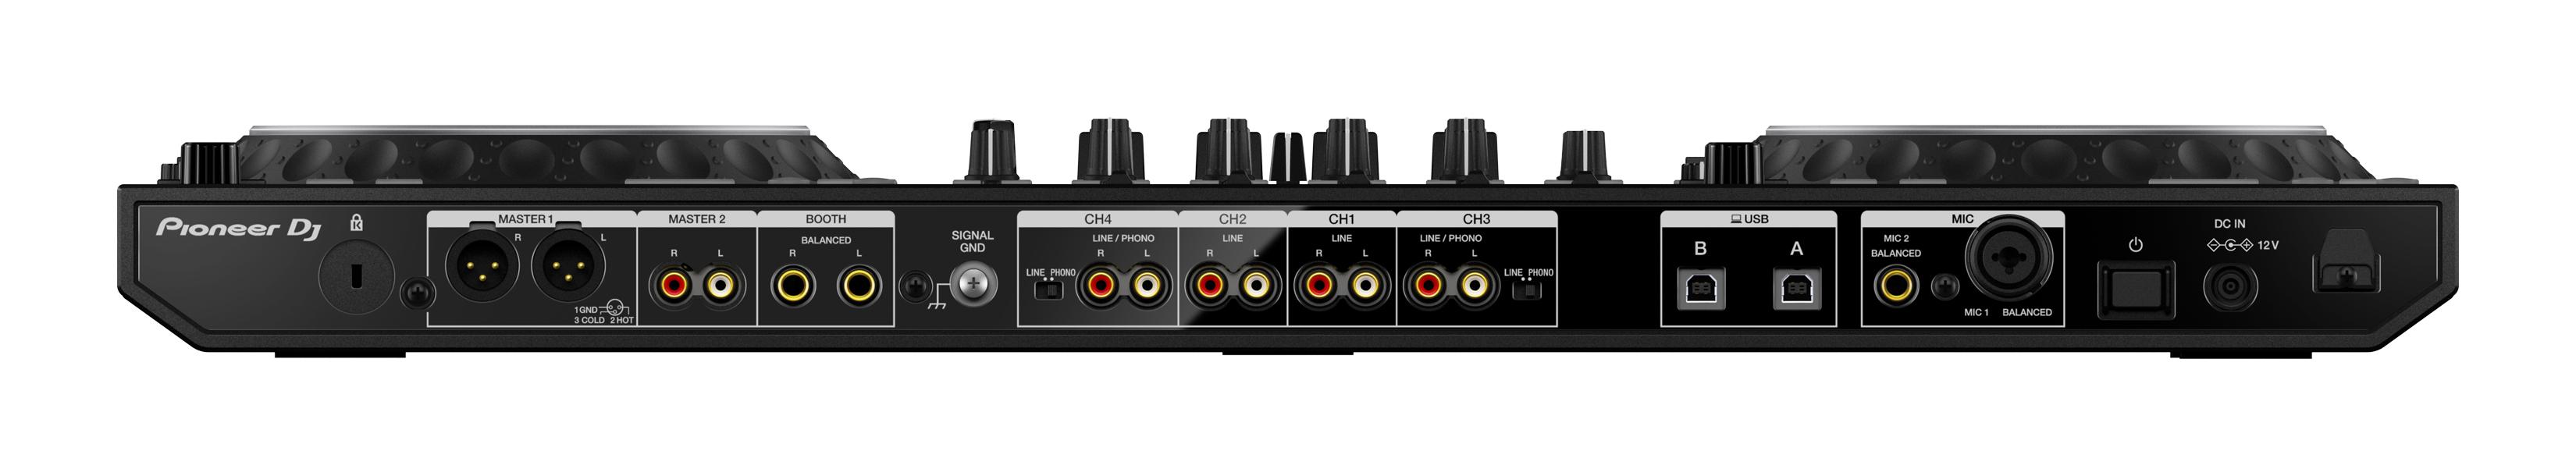 Pioneer DJ Announces the New DDJ-1000! – Pioneer DJ